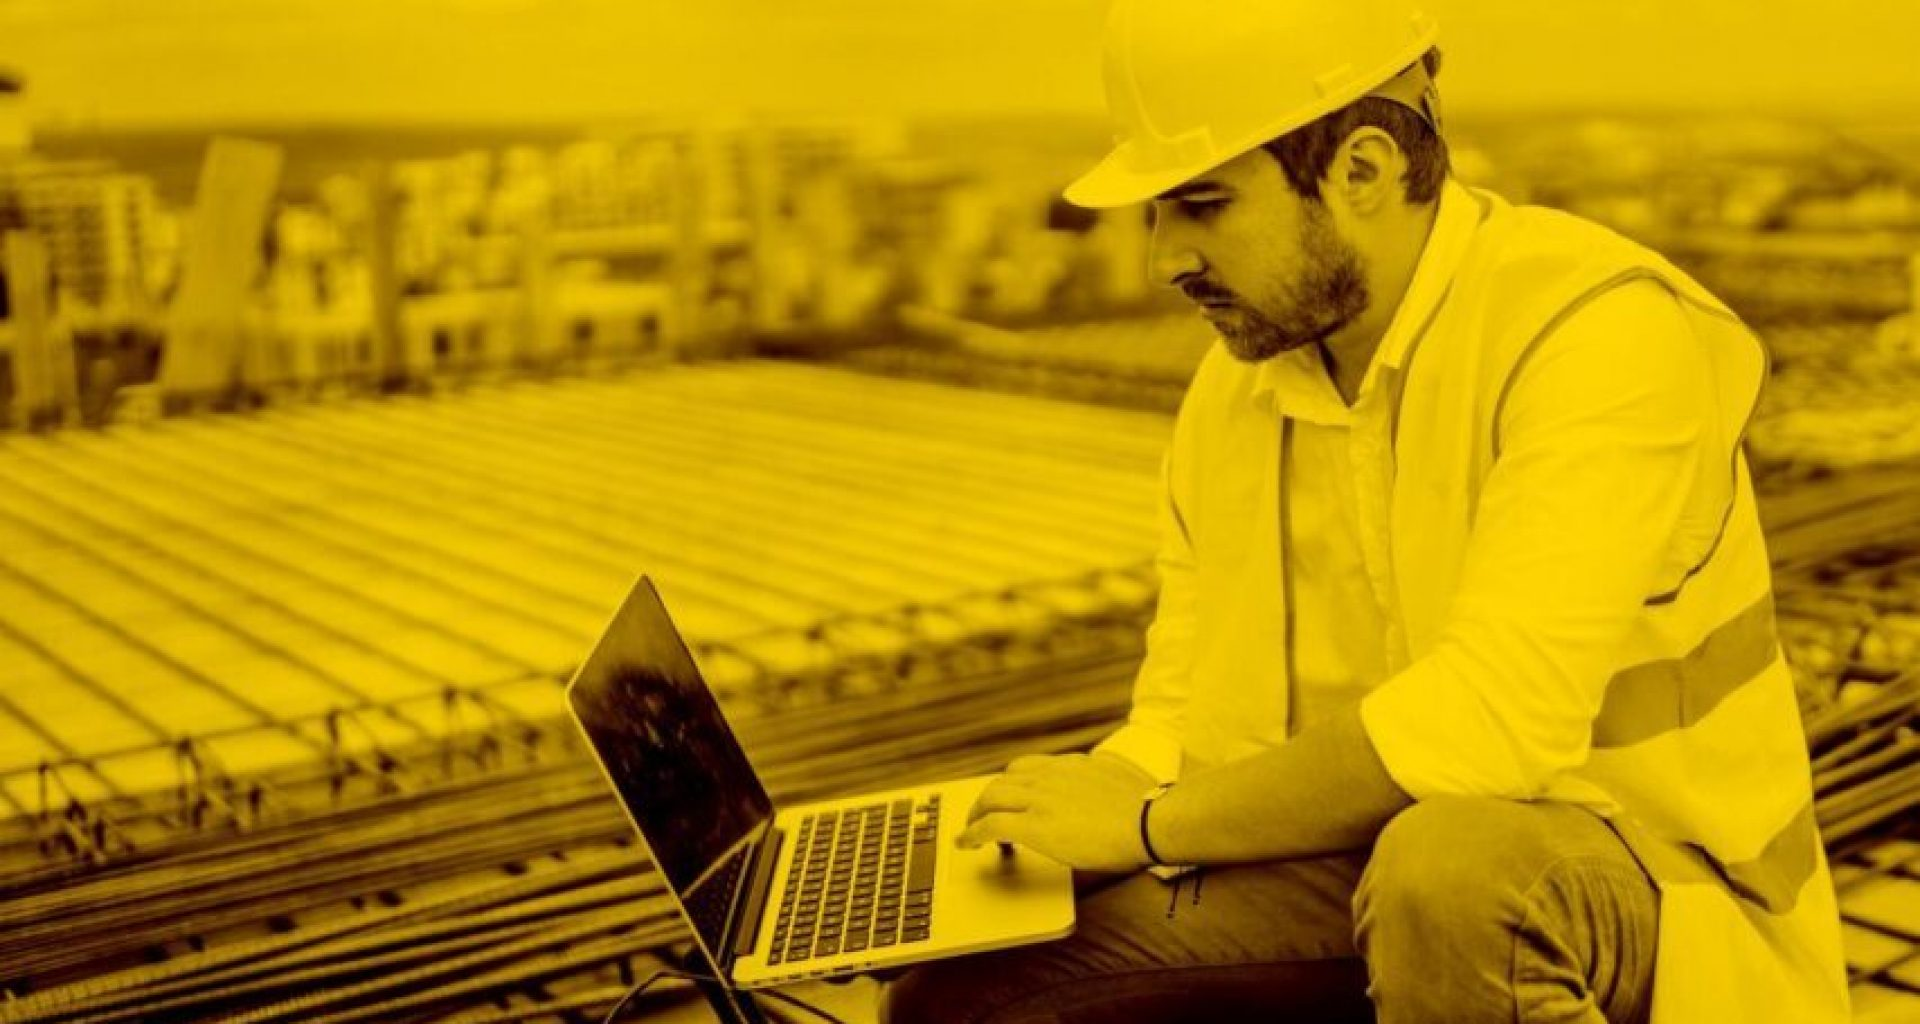 Bauarbeiter mit Labelwin auf dem Mac in der maja.cloud